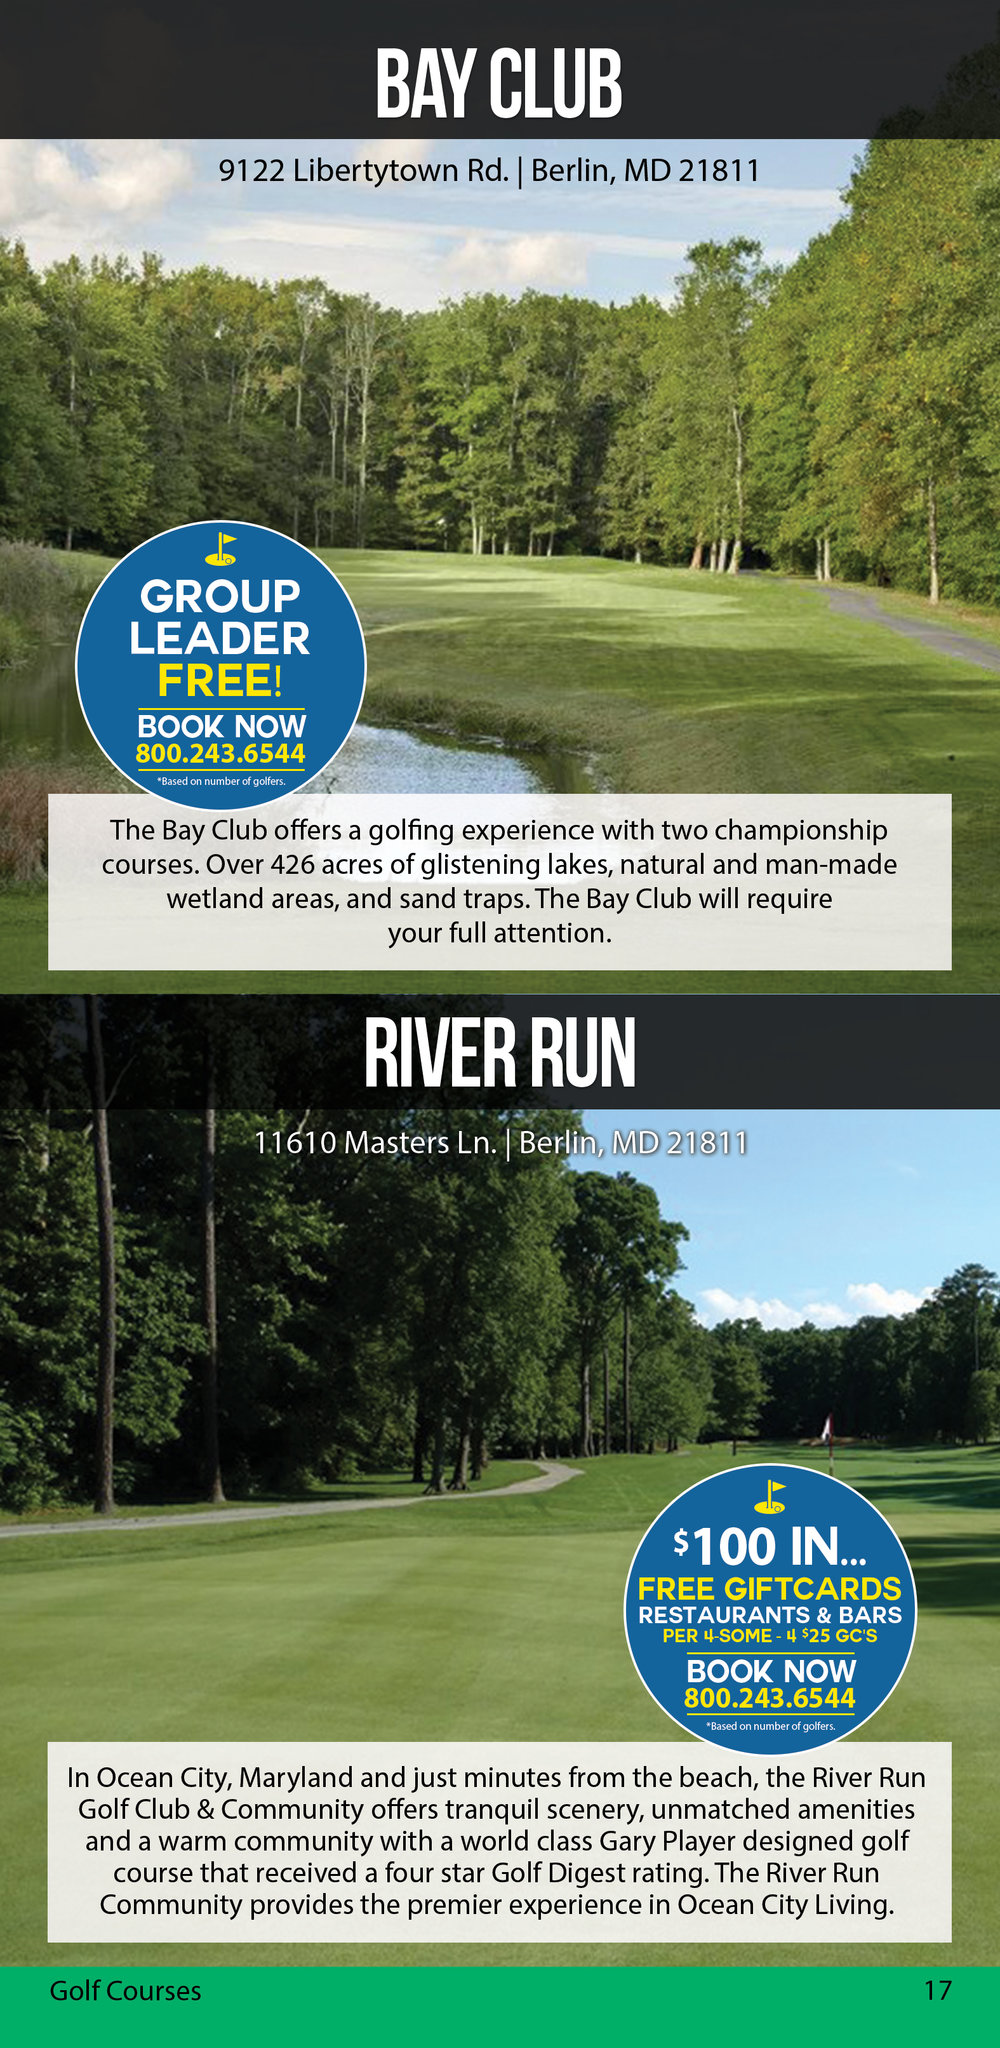 Page-17-Bay-Club-&-River-Run-.jpg